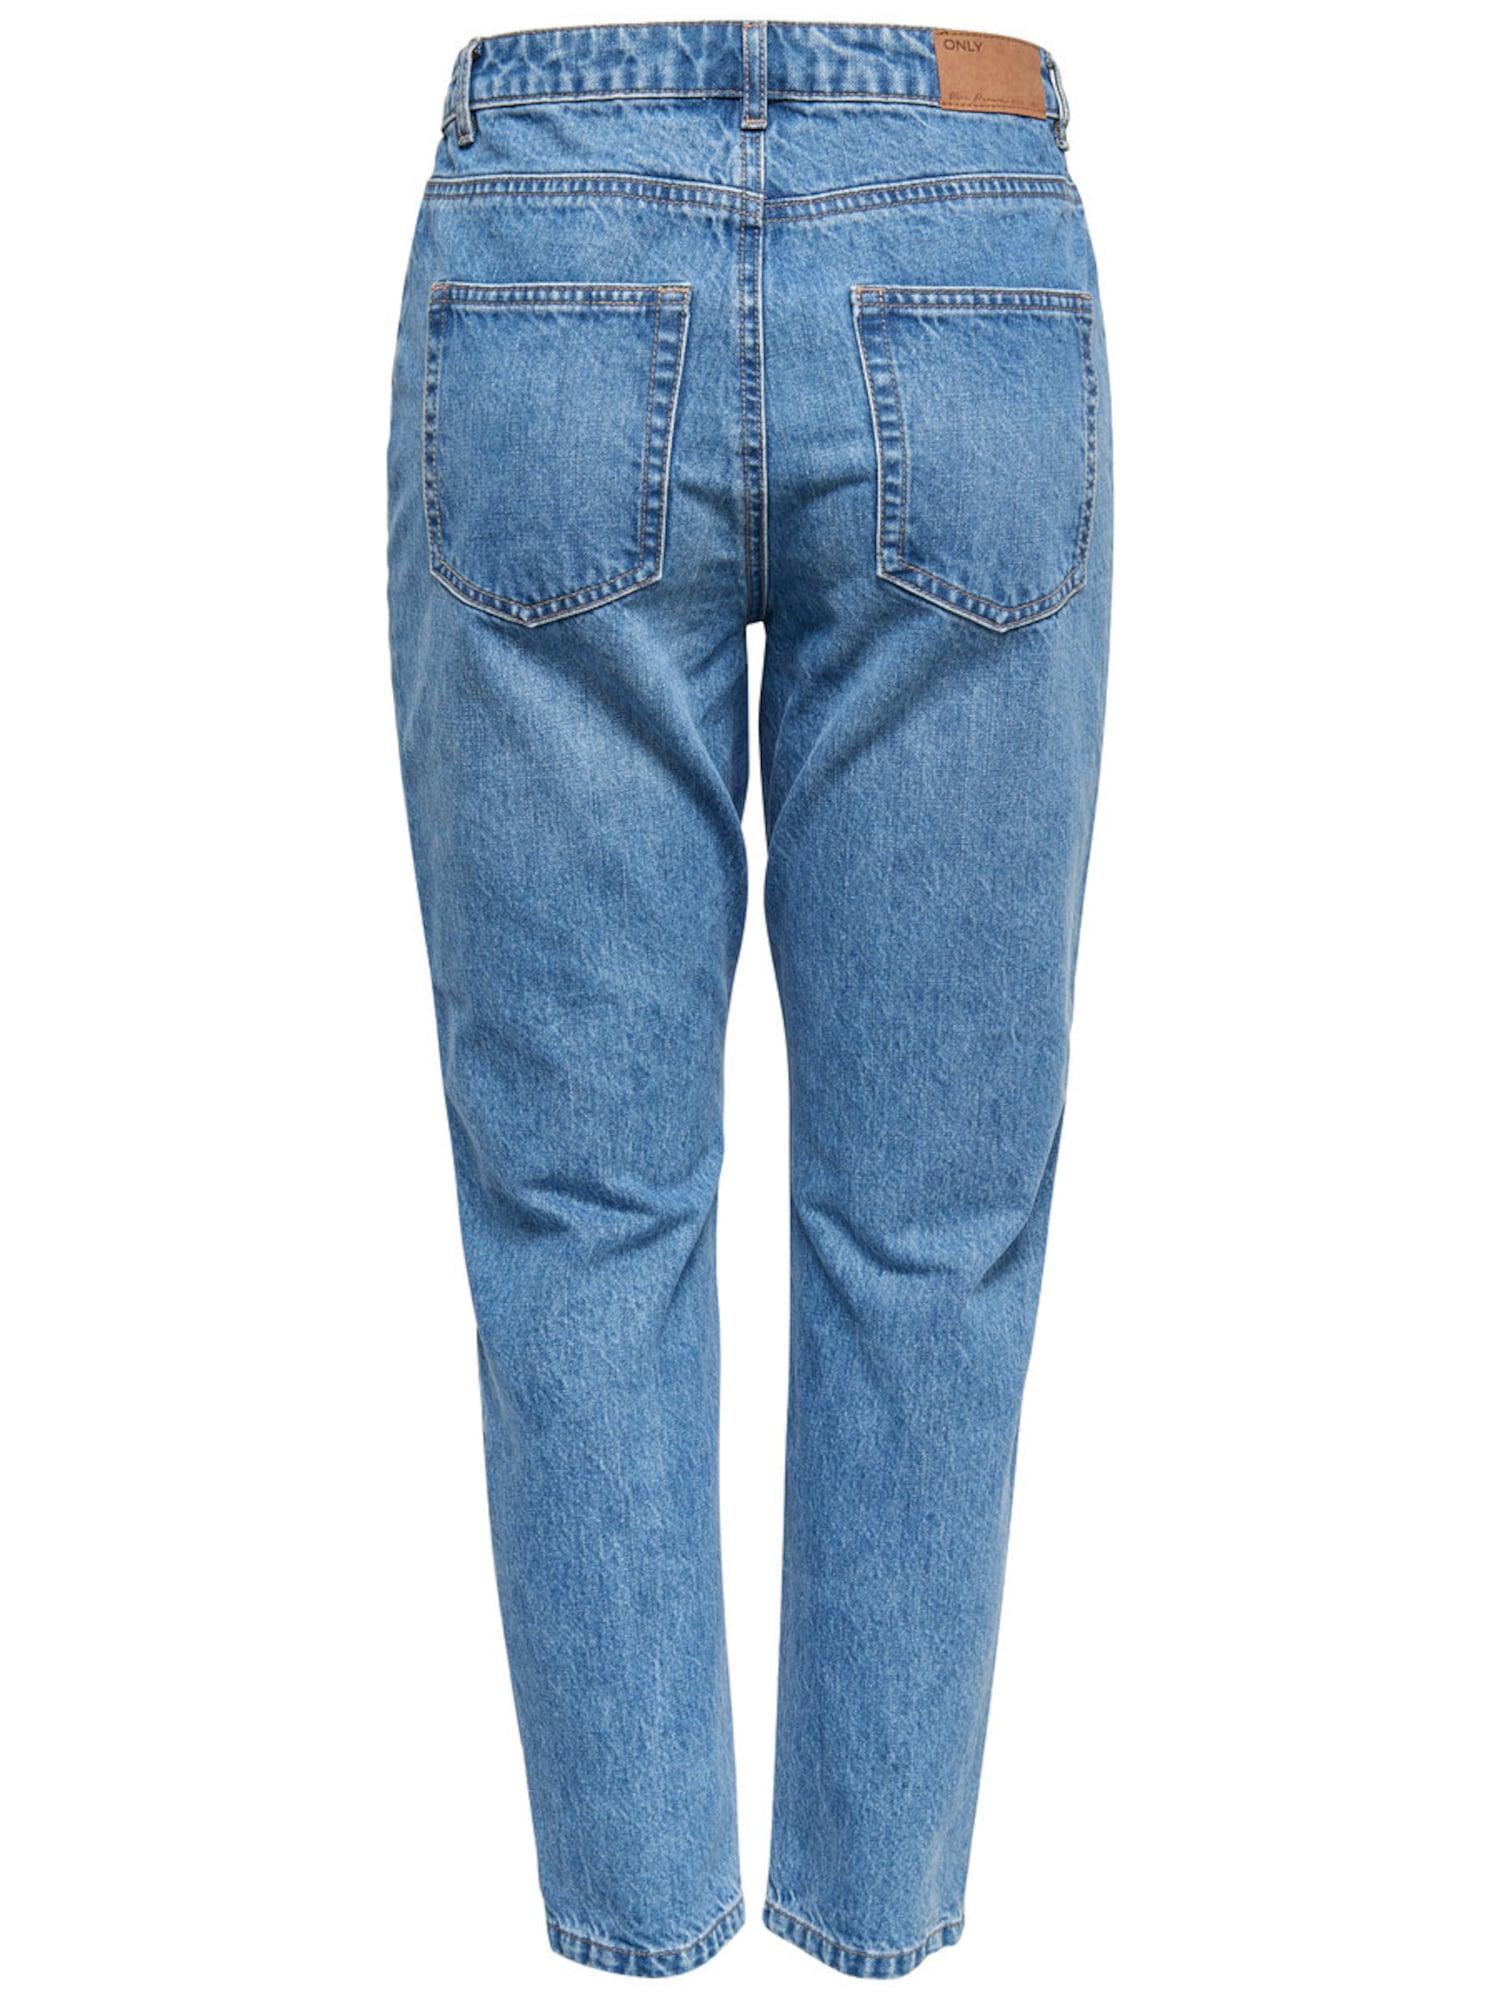 Jeans 'onlKELLY MOM DNM JEANSBj10541'